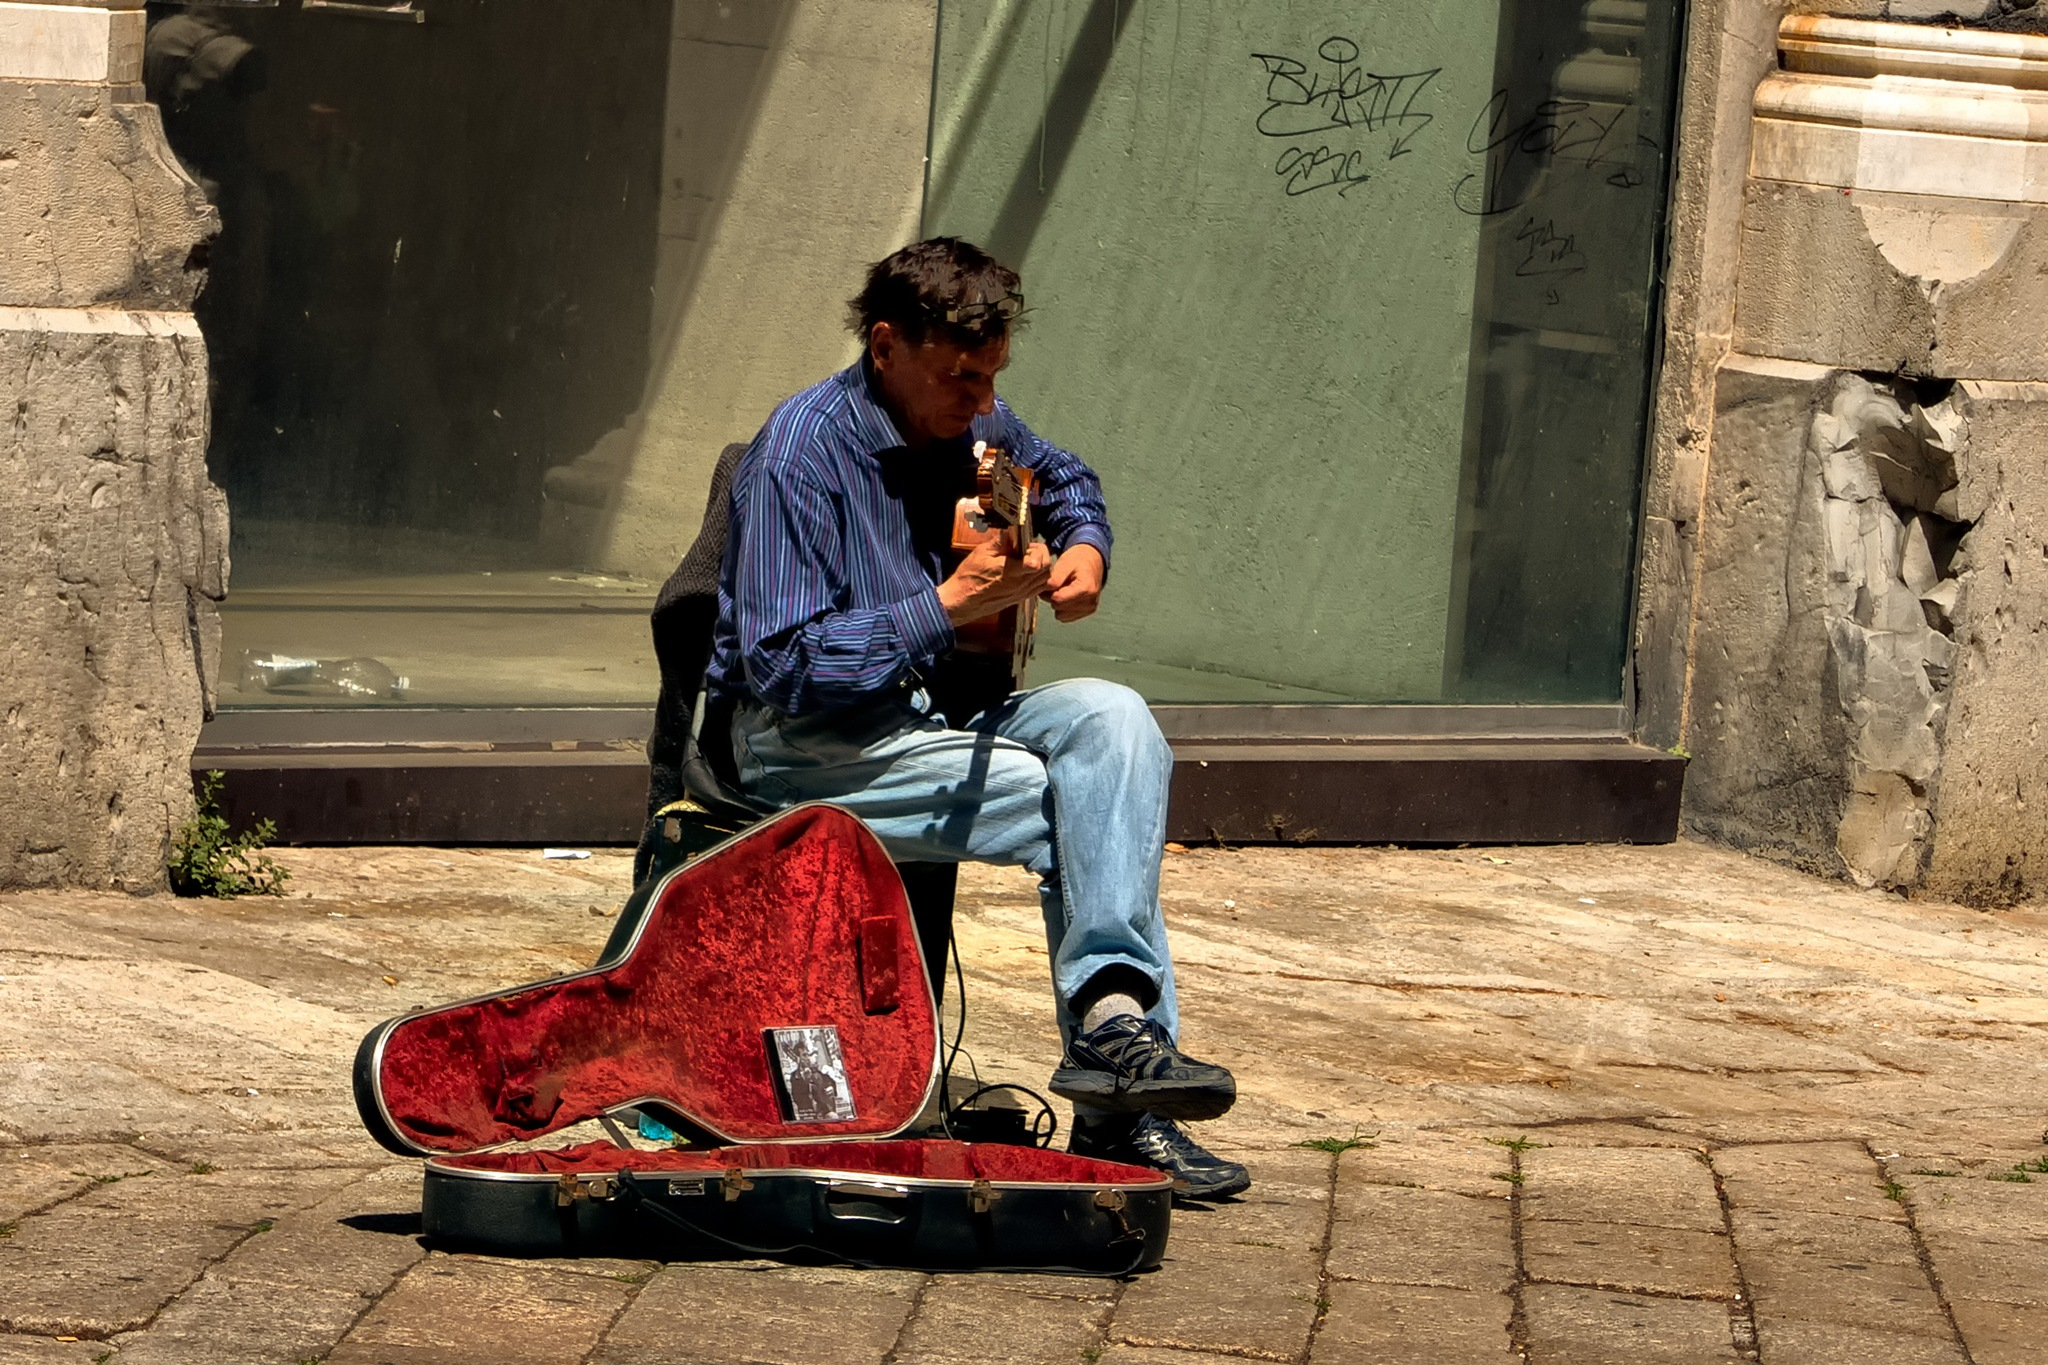 virtuous street guitar by sunrisesunset